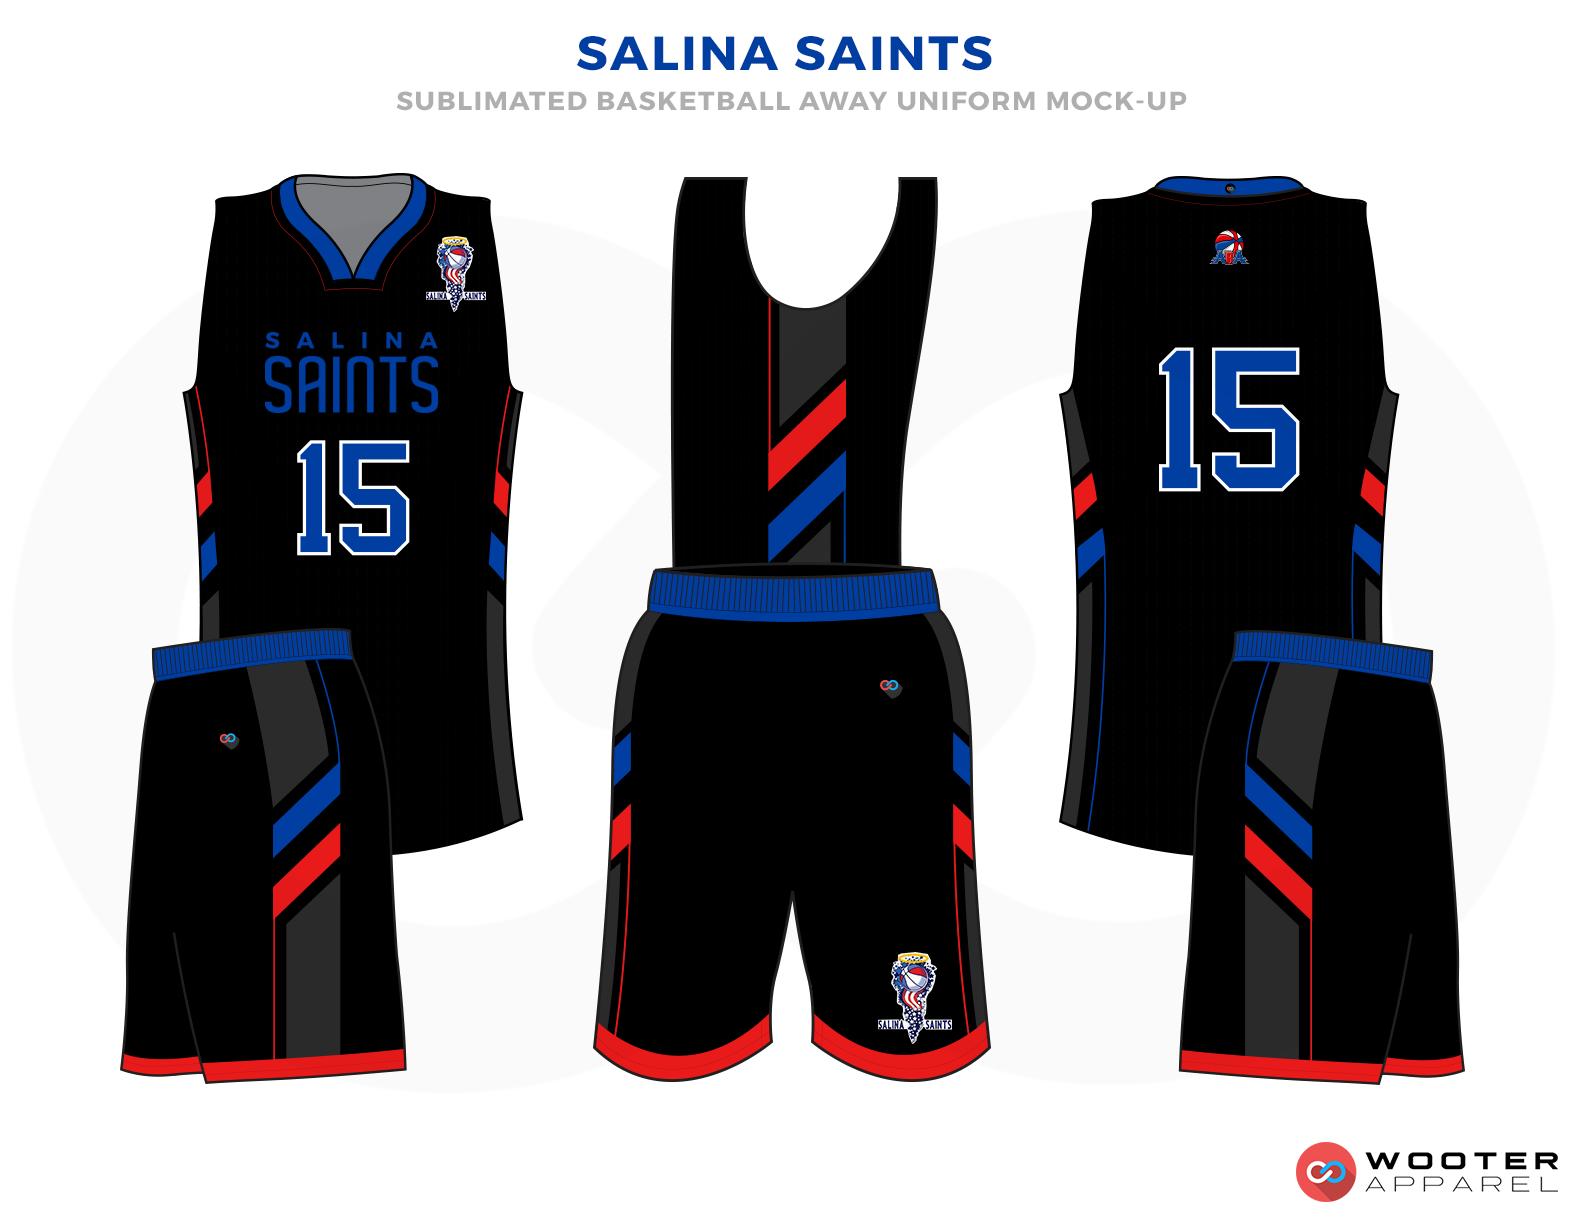 SalinaSaints-BasketballUniform-Away-Mockup.png